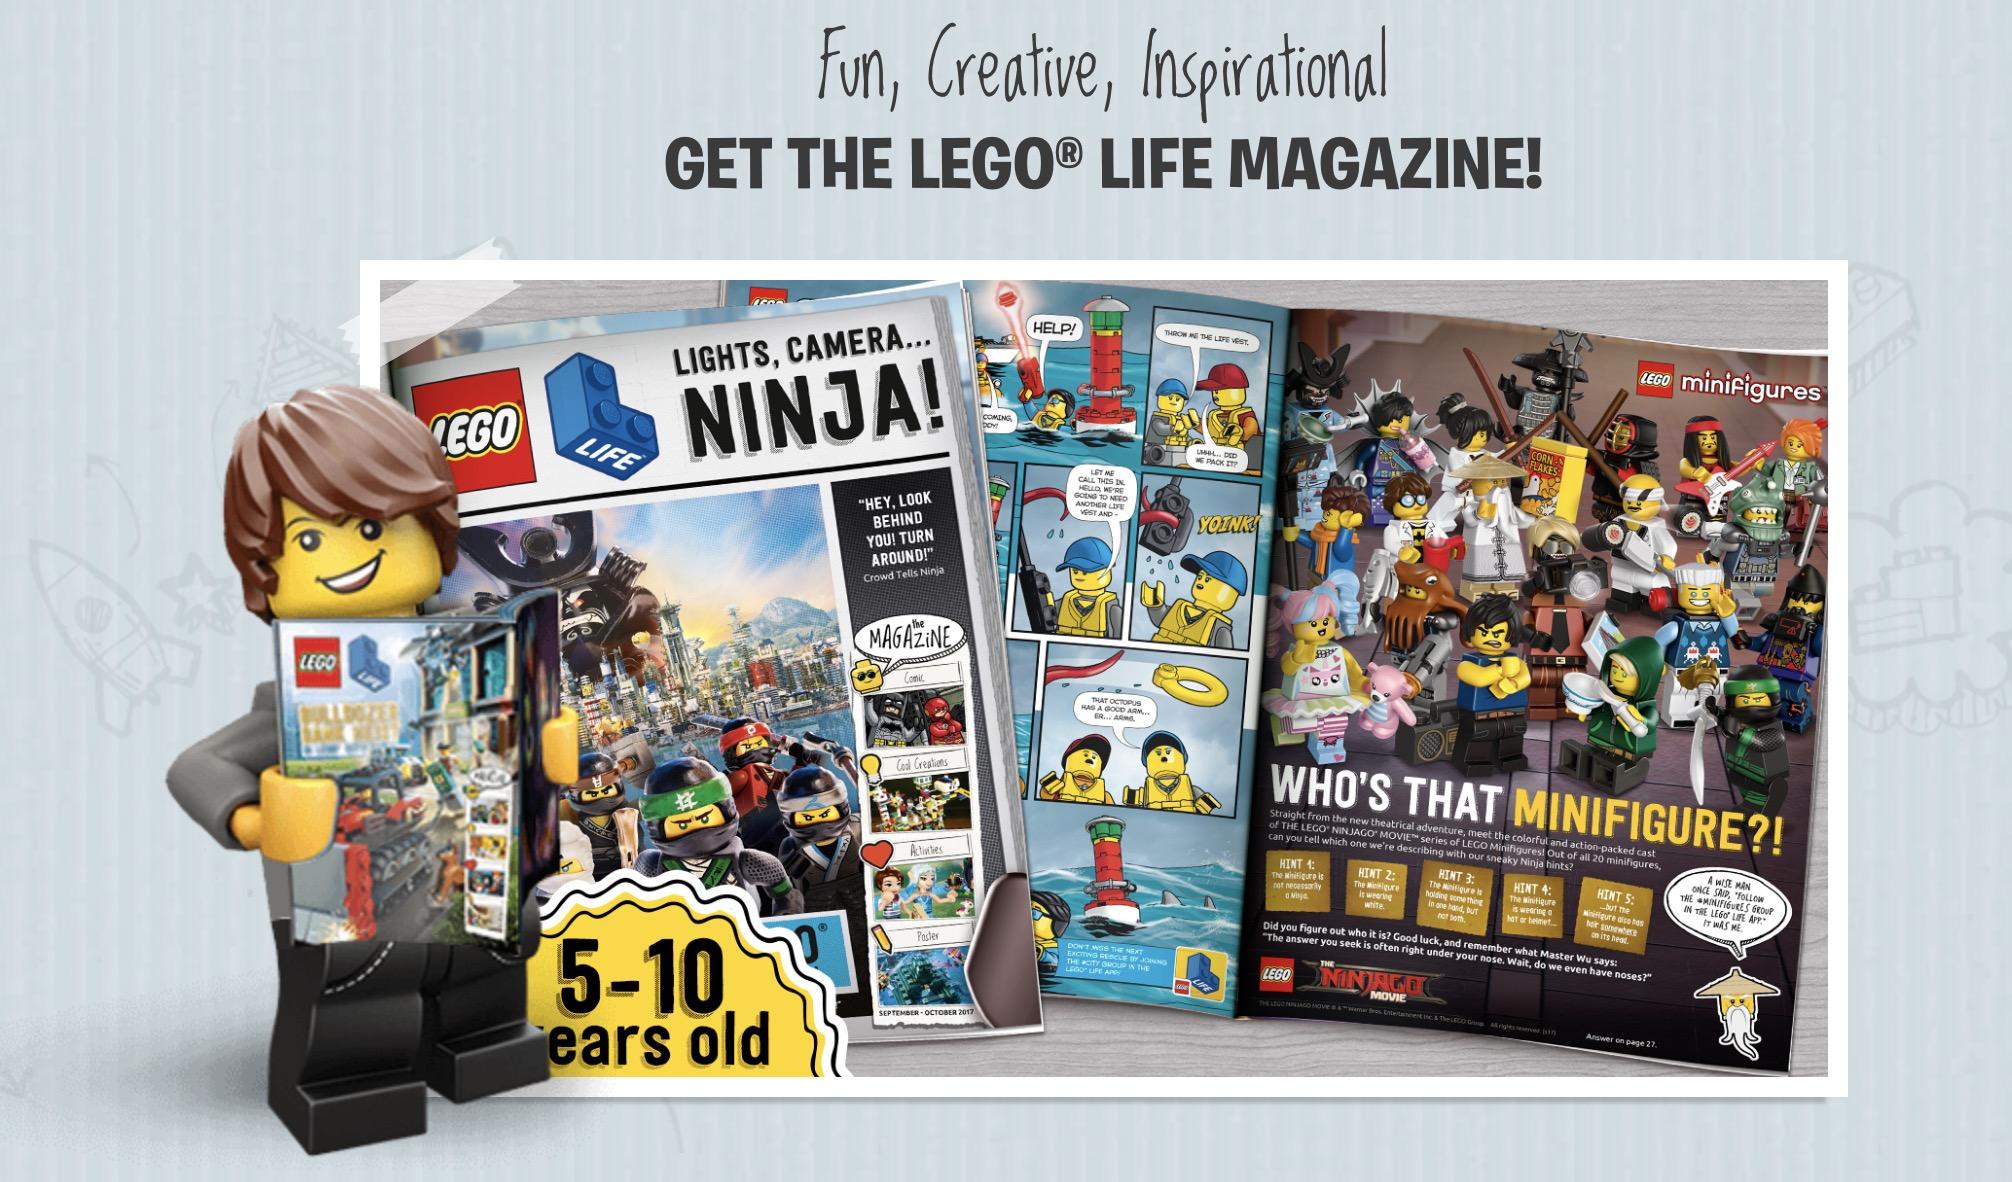 Subscription to LEGO Magazine! FREE